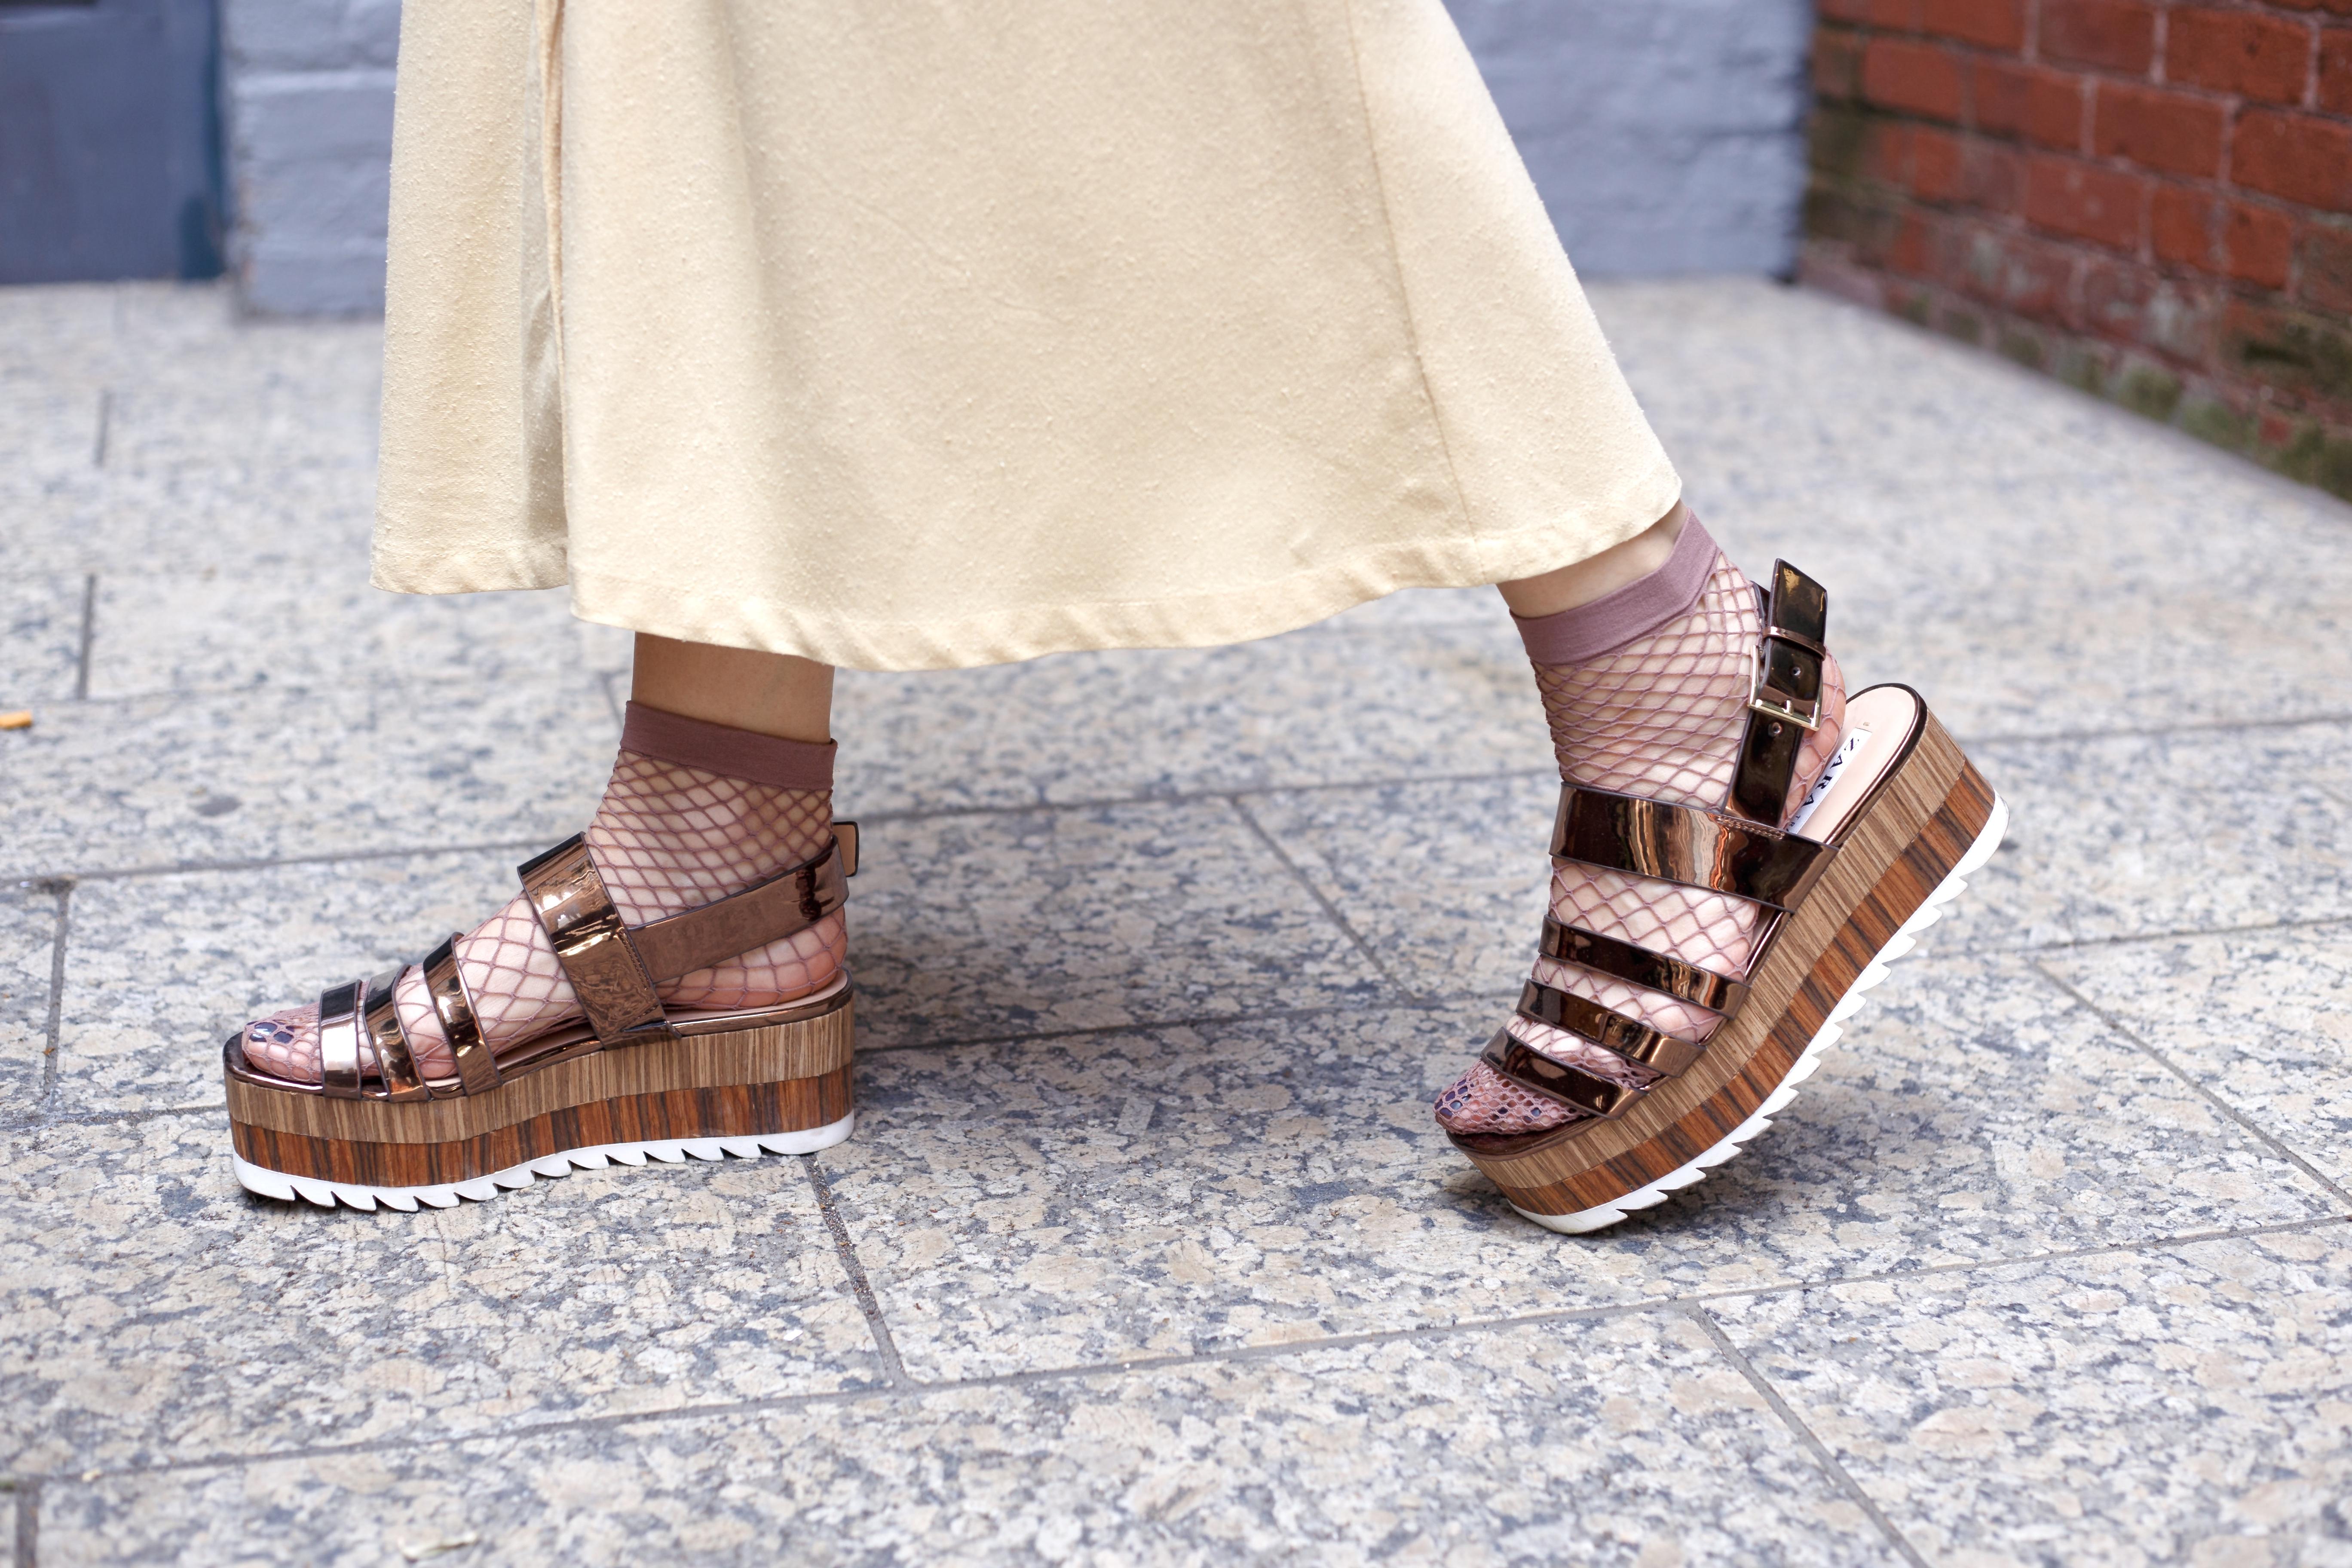 Maxi dress and fishnet socks